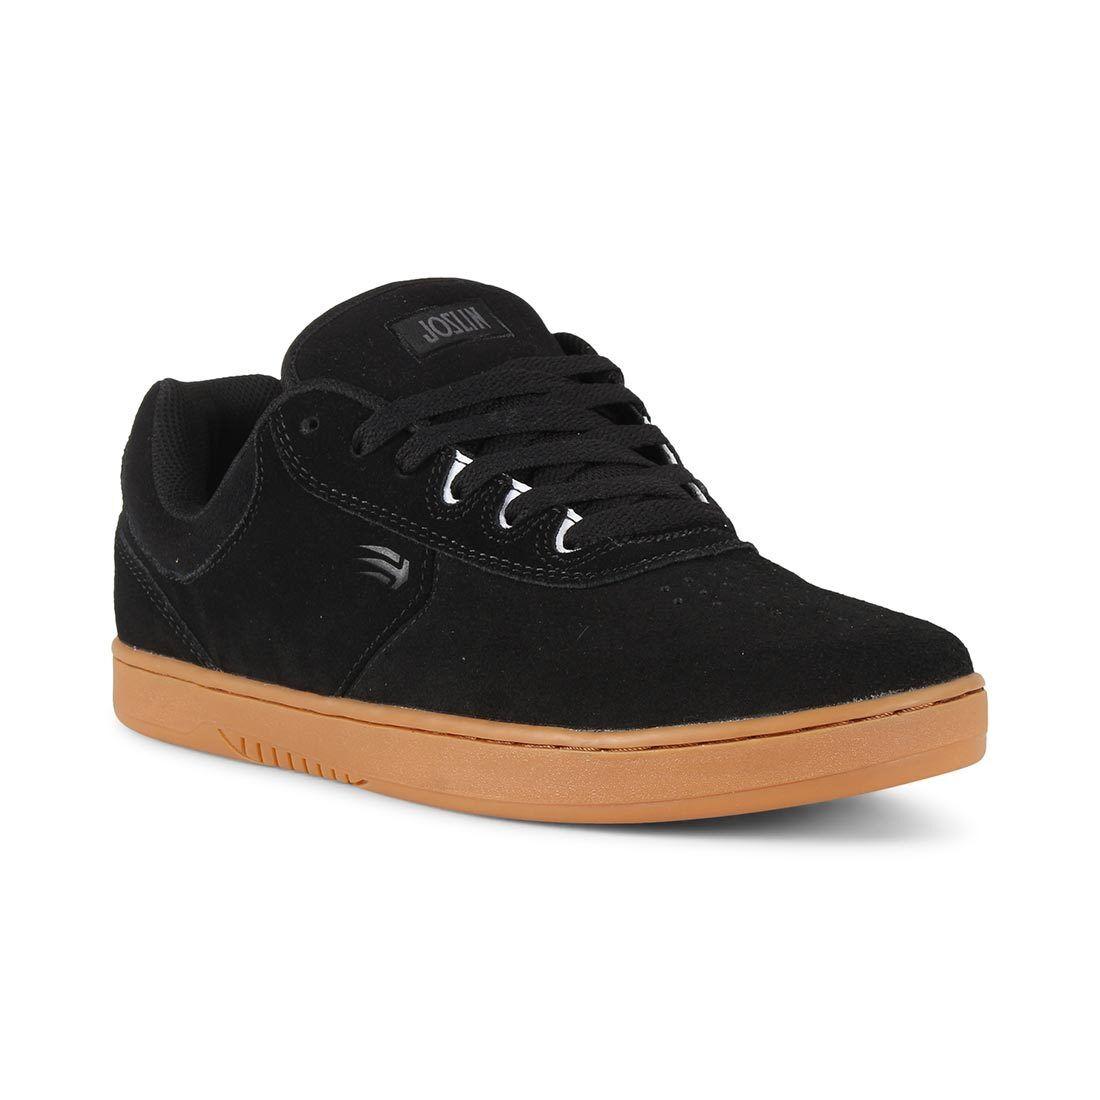 Etnies Joslin shoes - Black   Gum